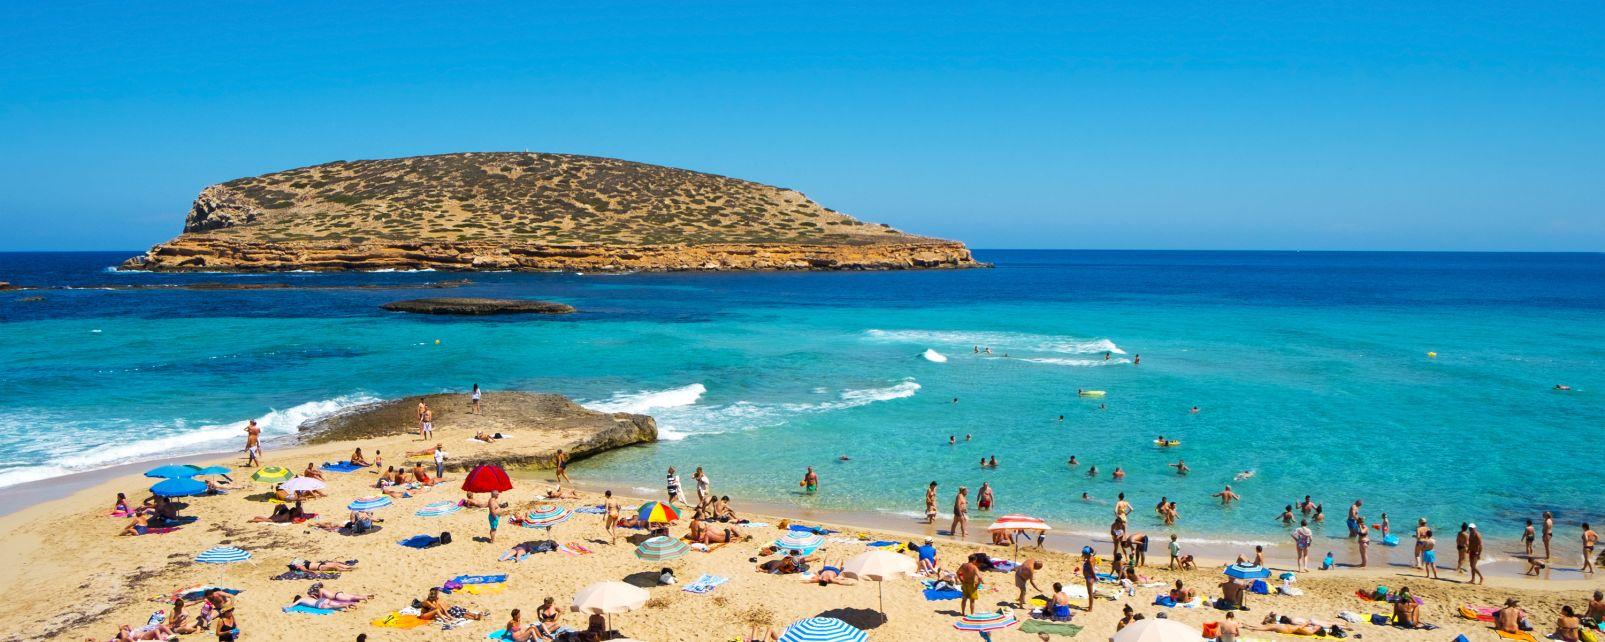 Ibiza, Le rive, Baleari